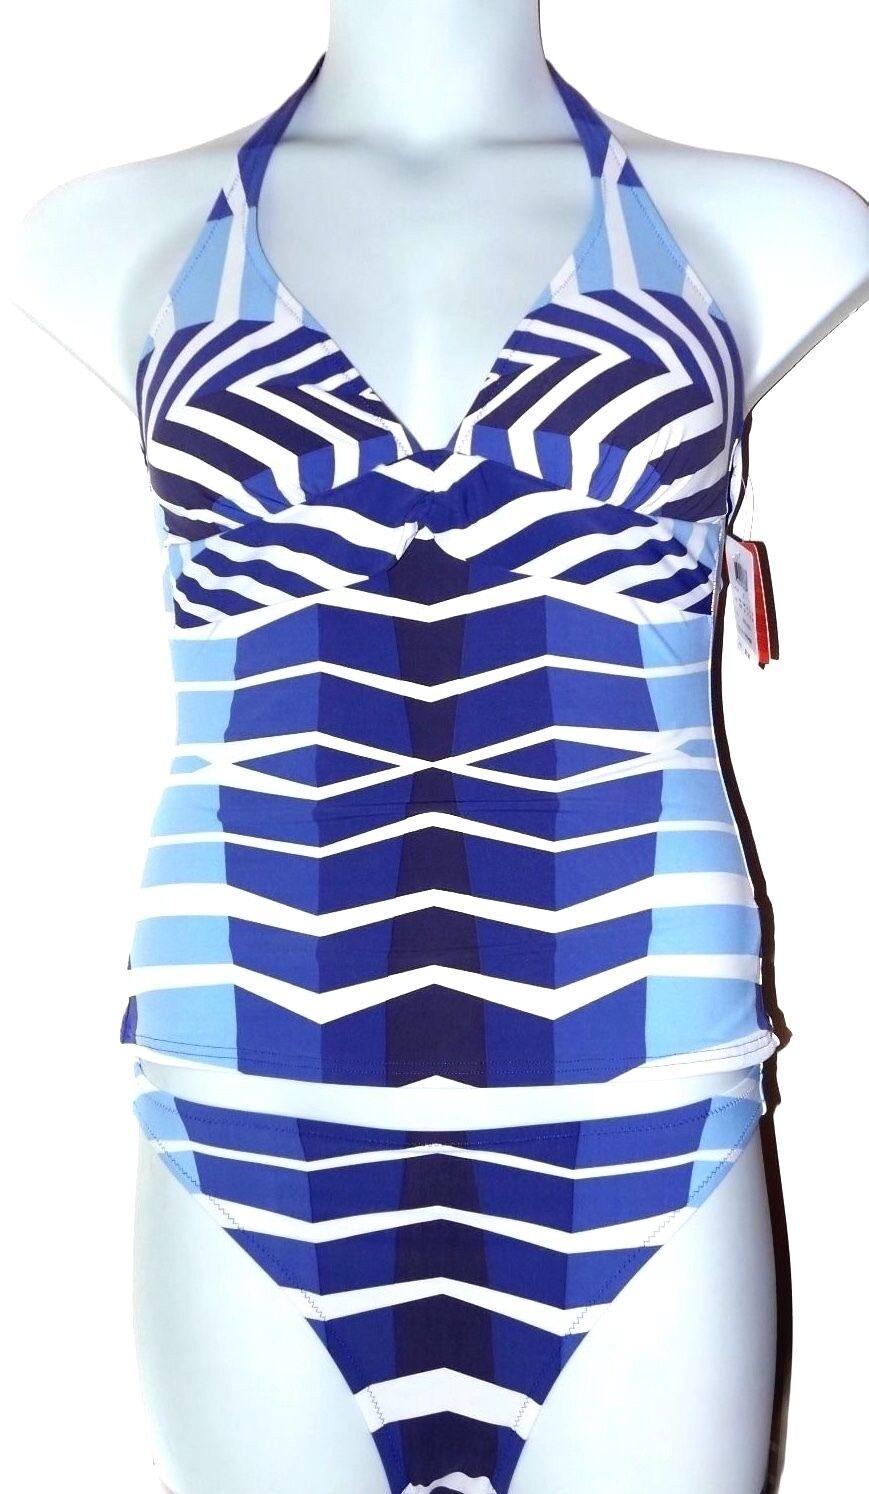 126 NWT GOTTEX GEOMETRIC DECO 2 Piece Tankini Bikini Swimsuit Size 6 36 B Cup